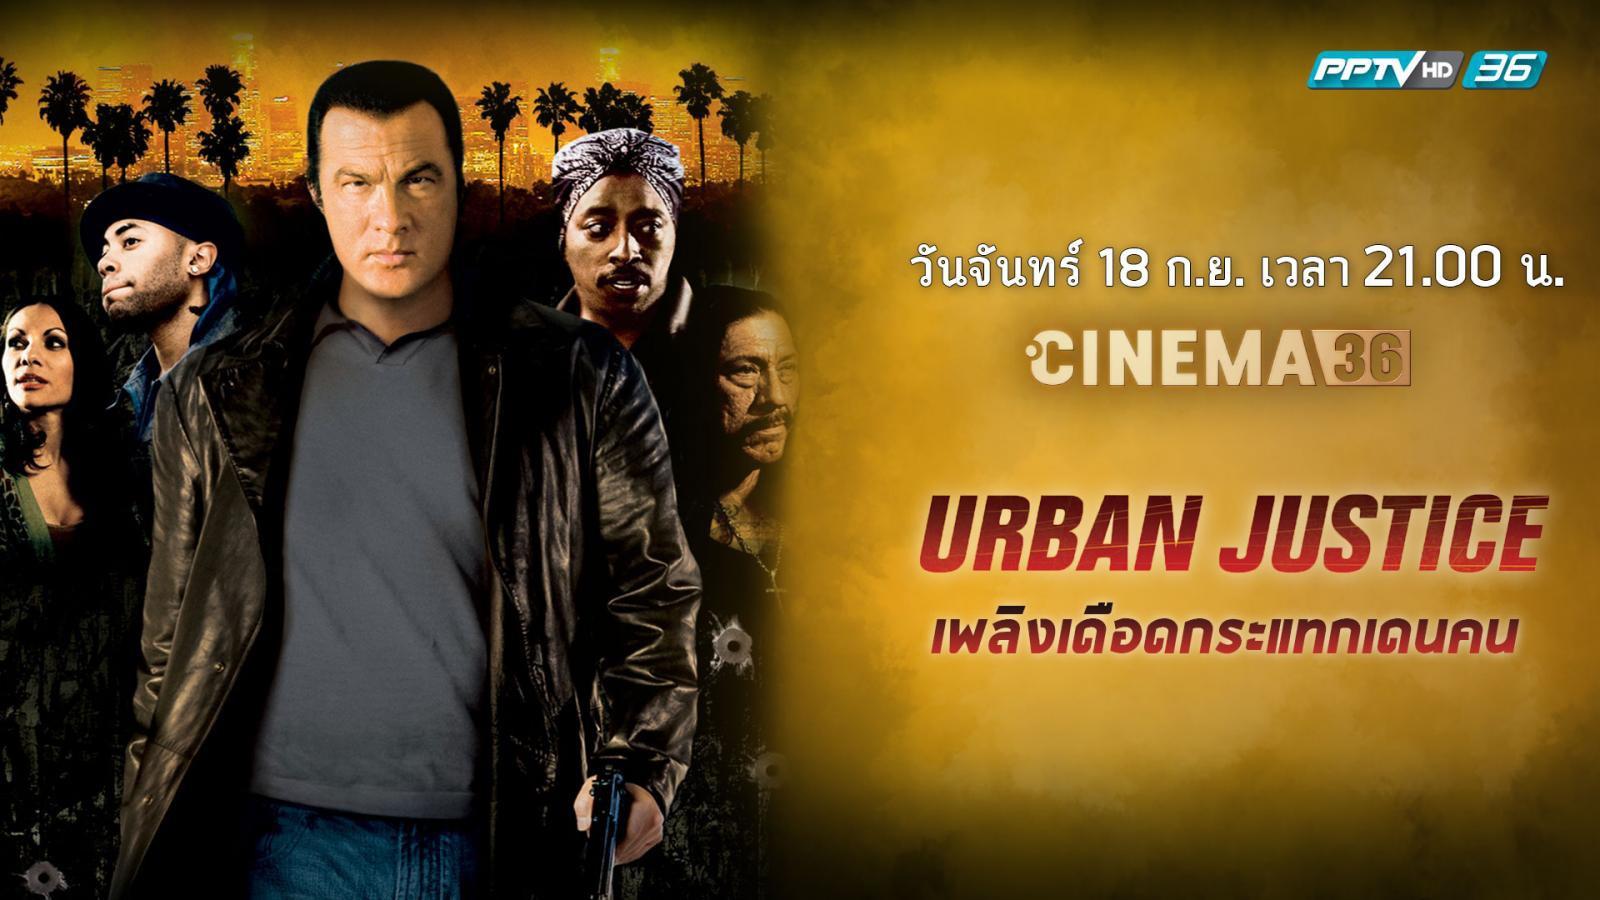 Urban Justice เพลิงเดือดกระแทกเดนคน